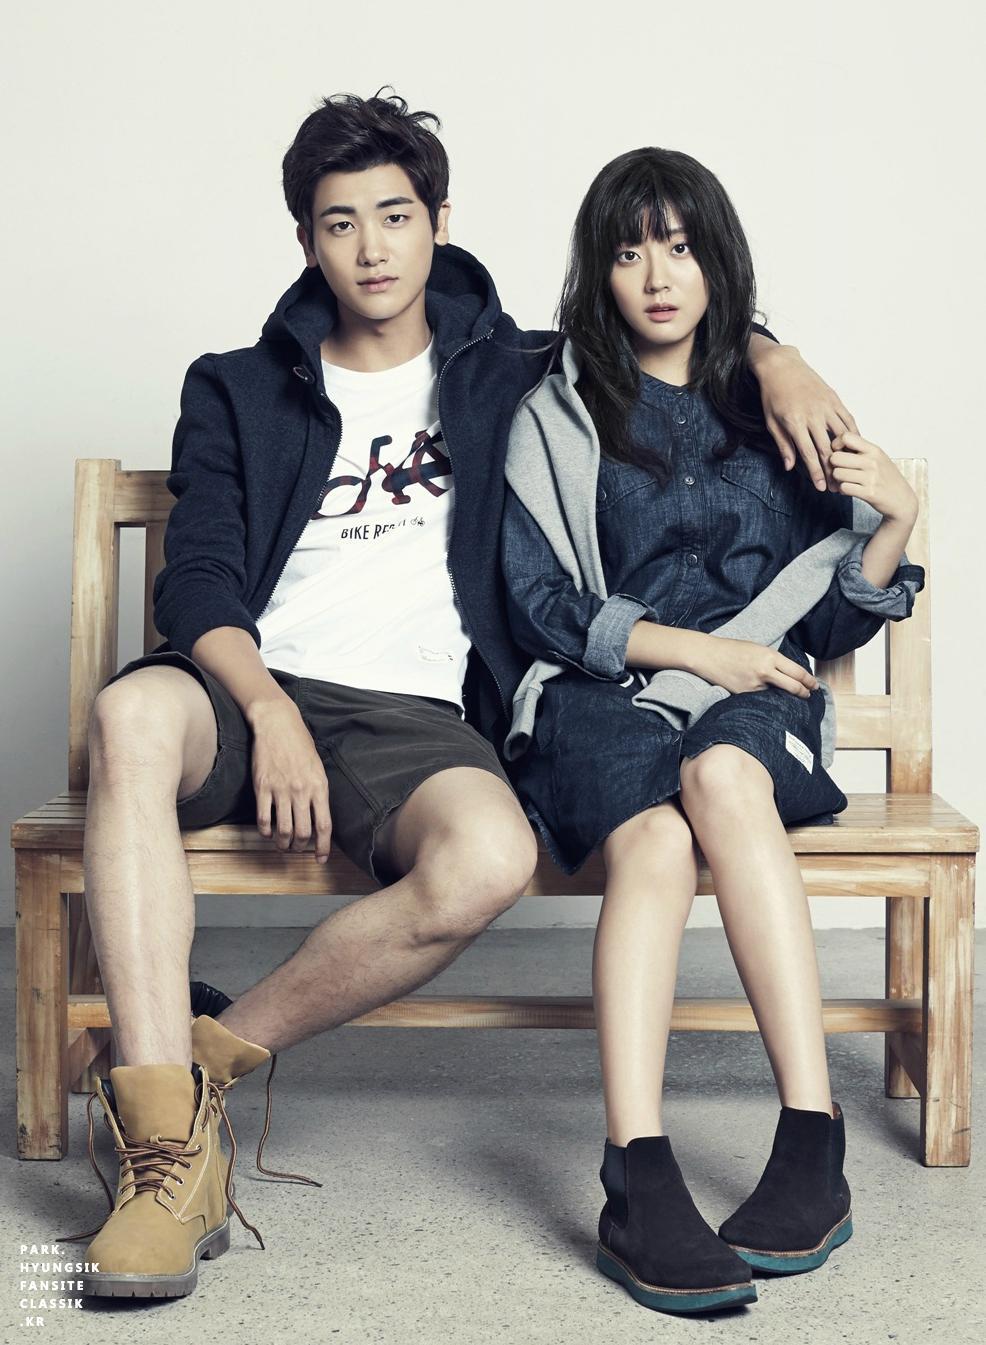 park hyungsik and nam ji hyun dating games